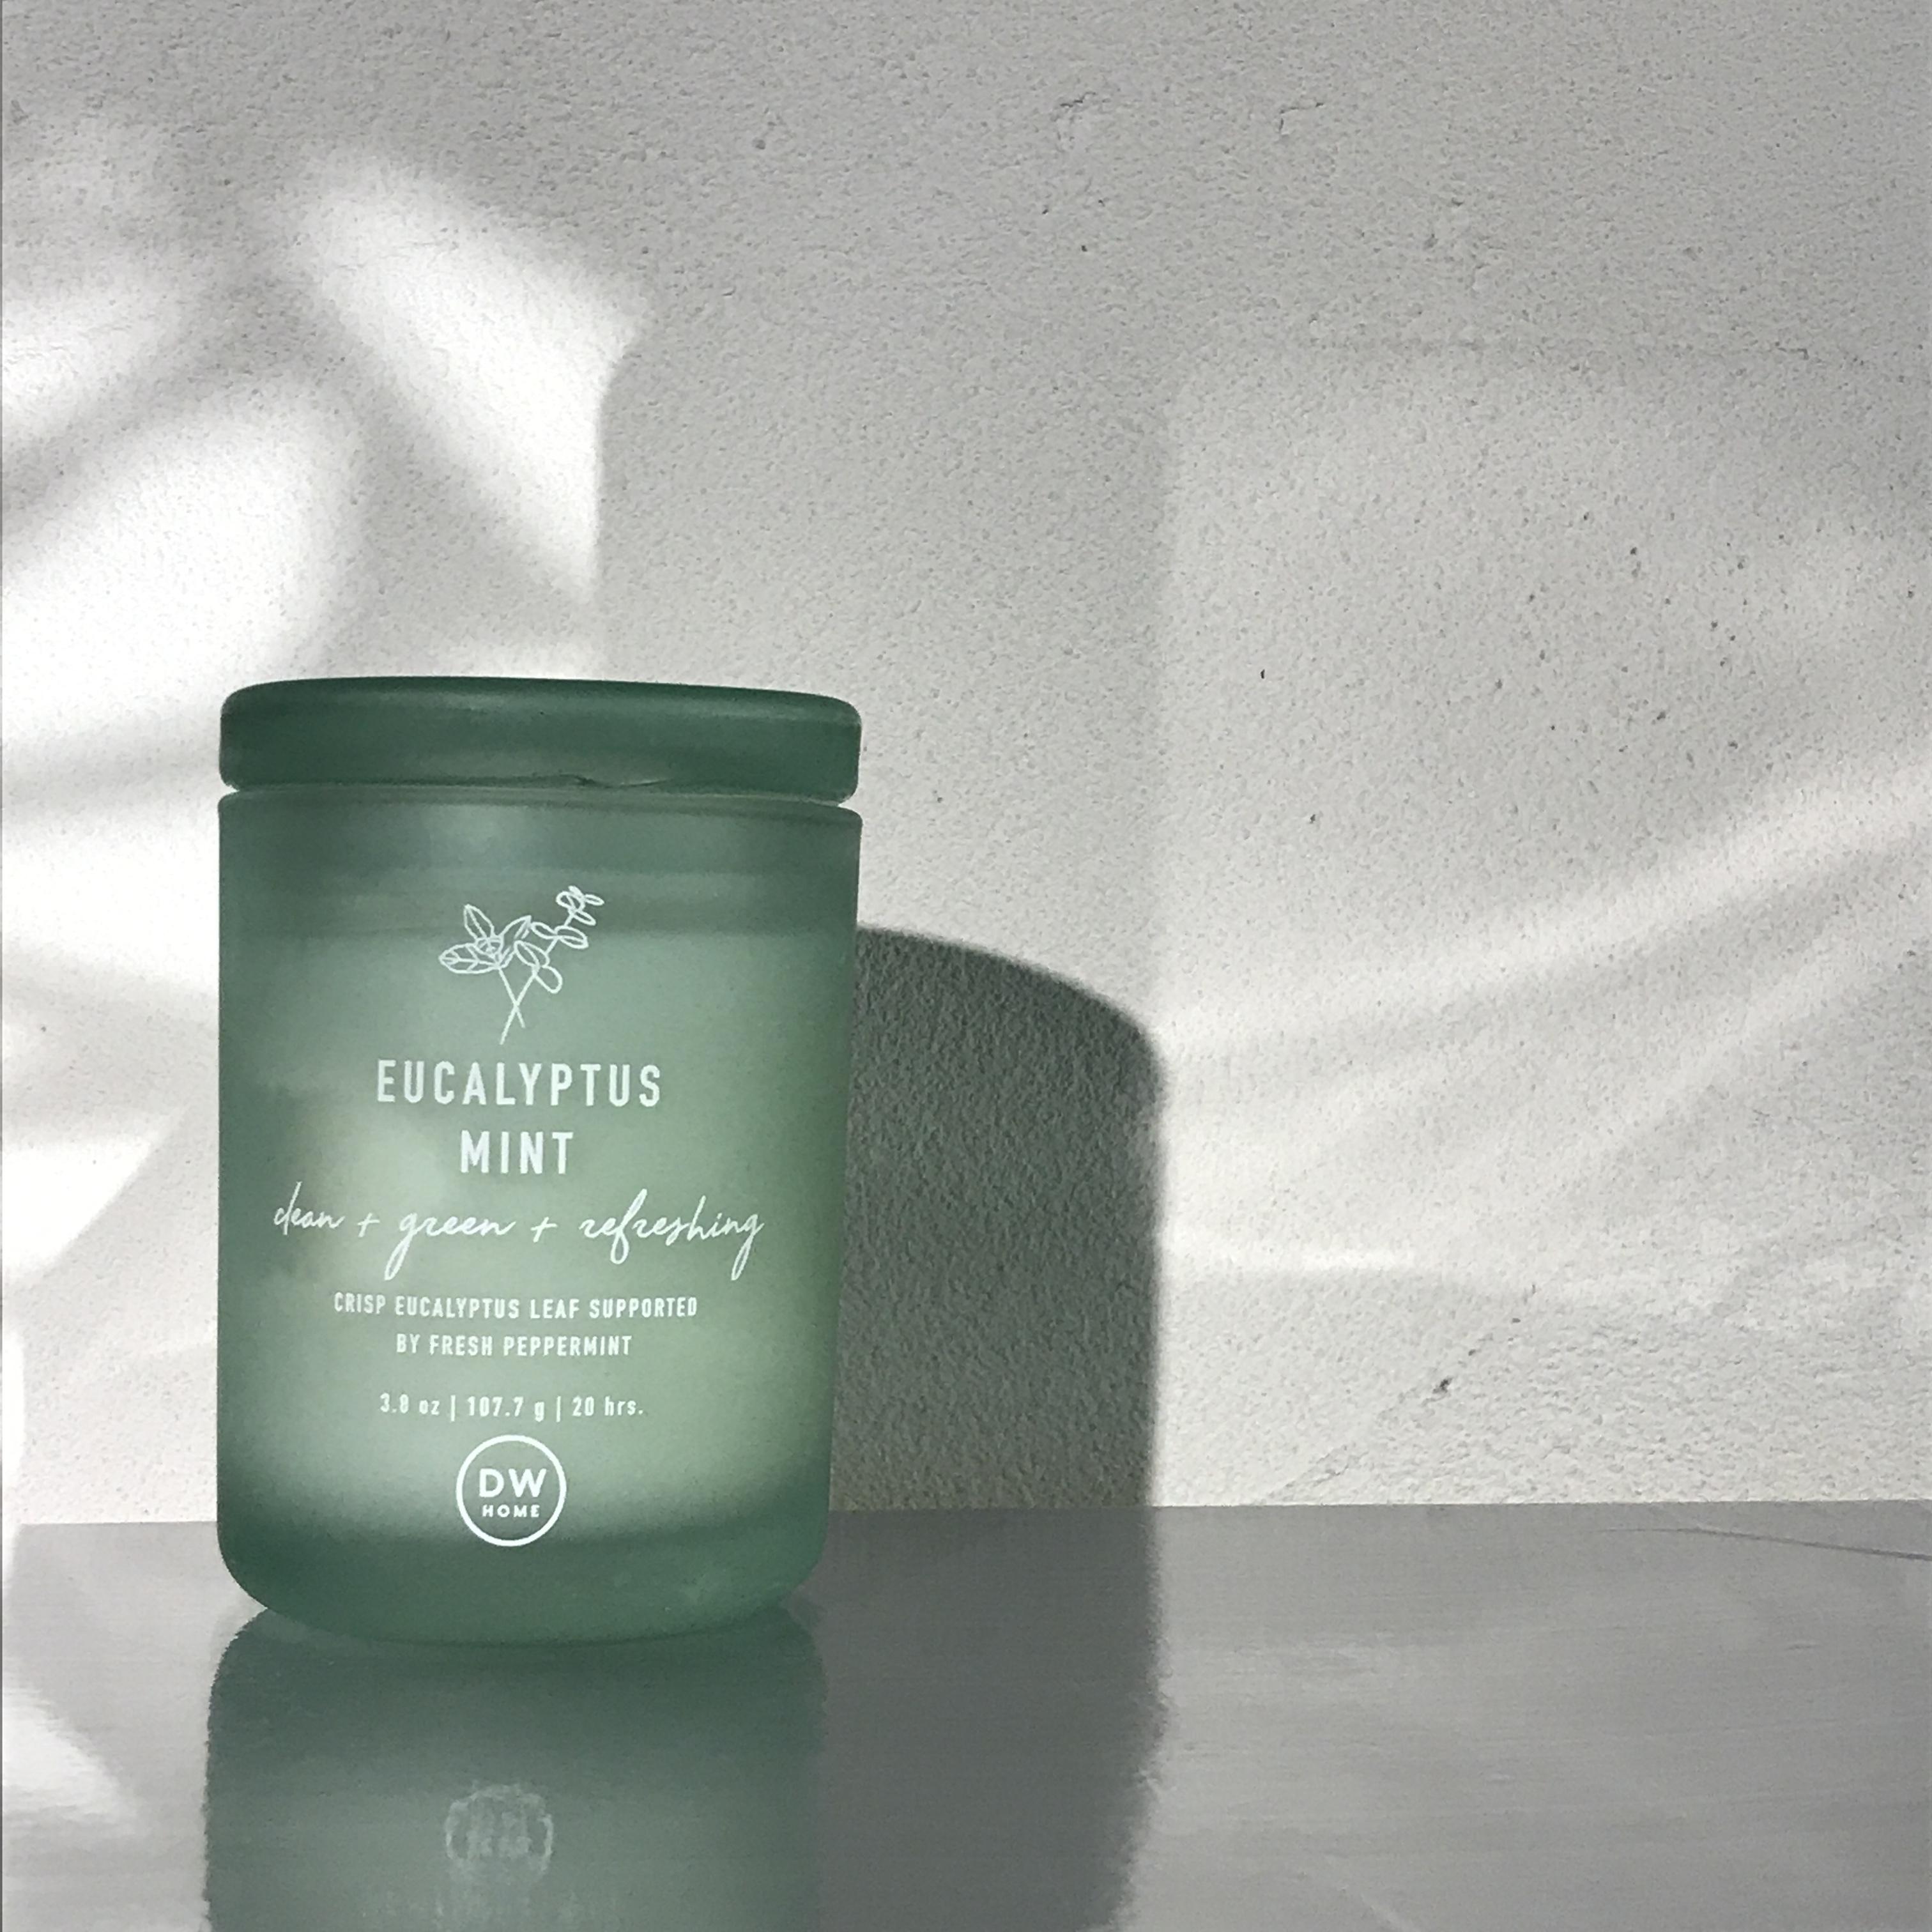 【Dw Home Candles】EUCALYPTUS MINT【アロマキャンドル】